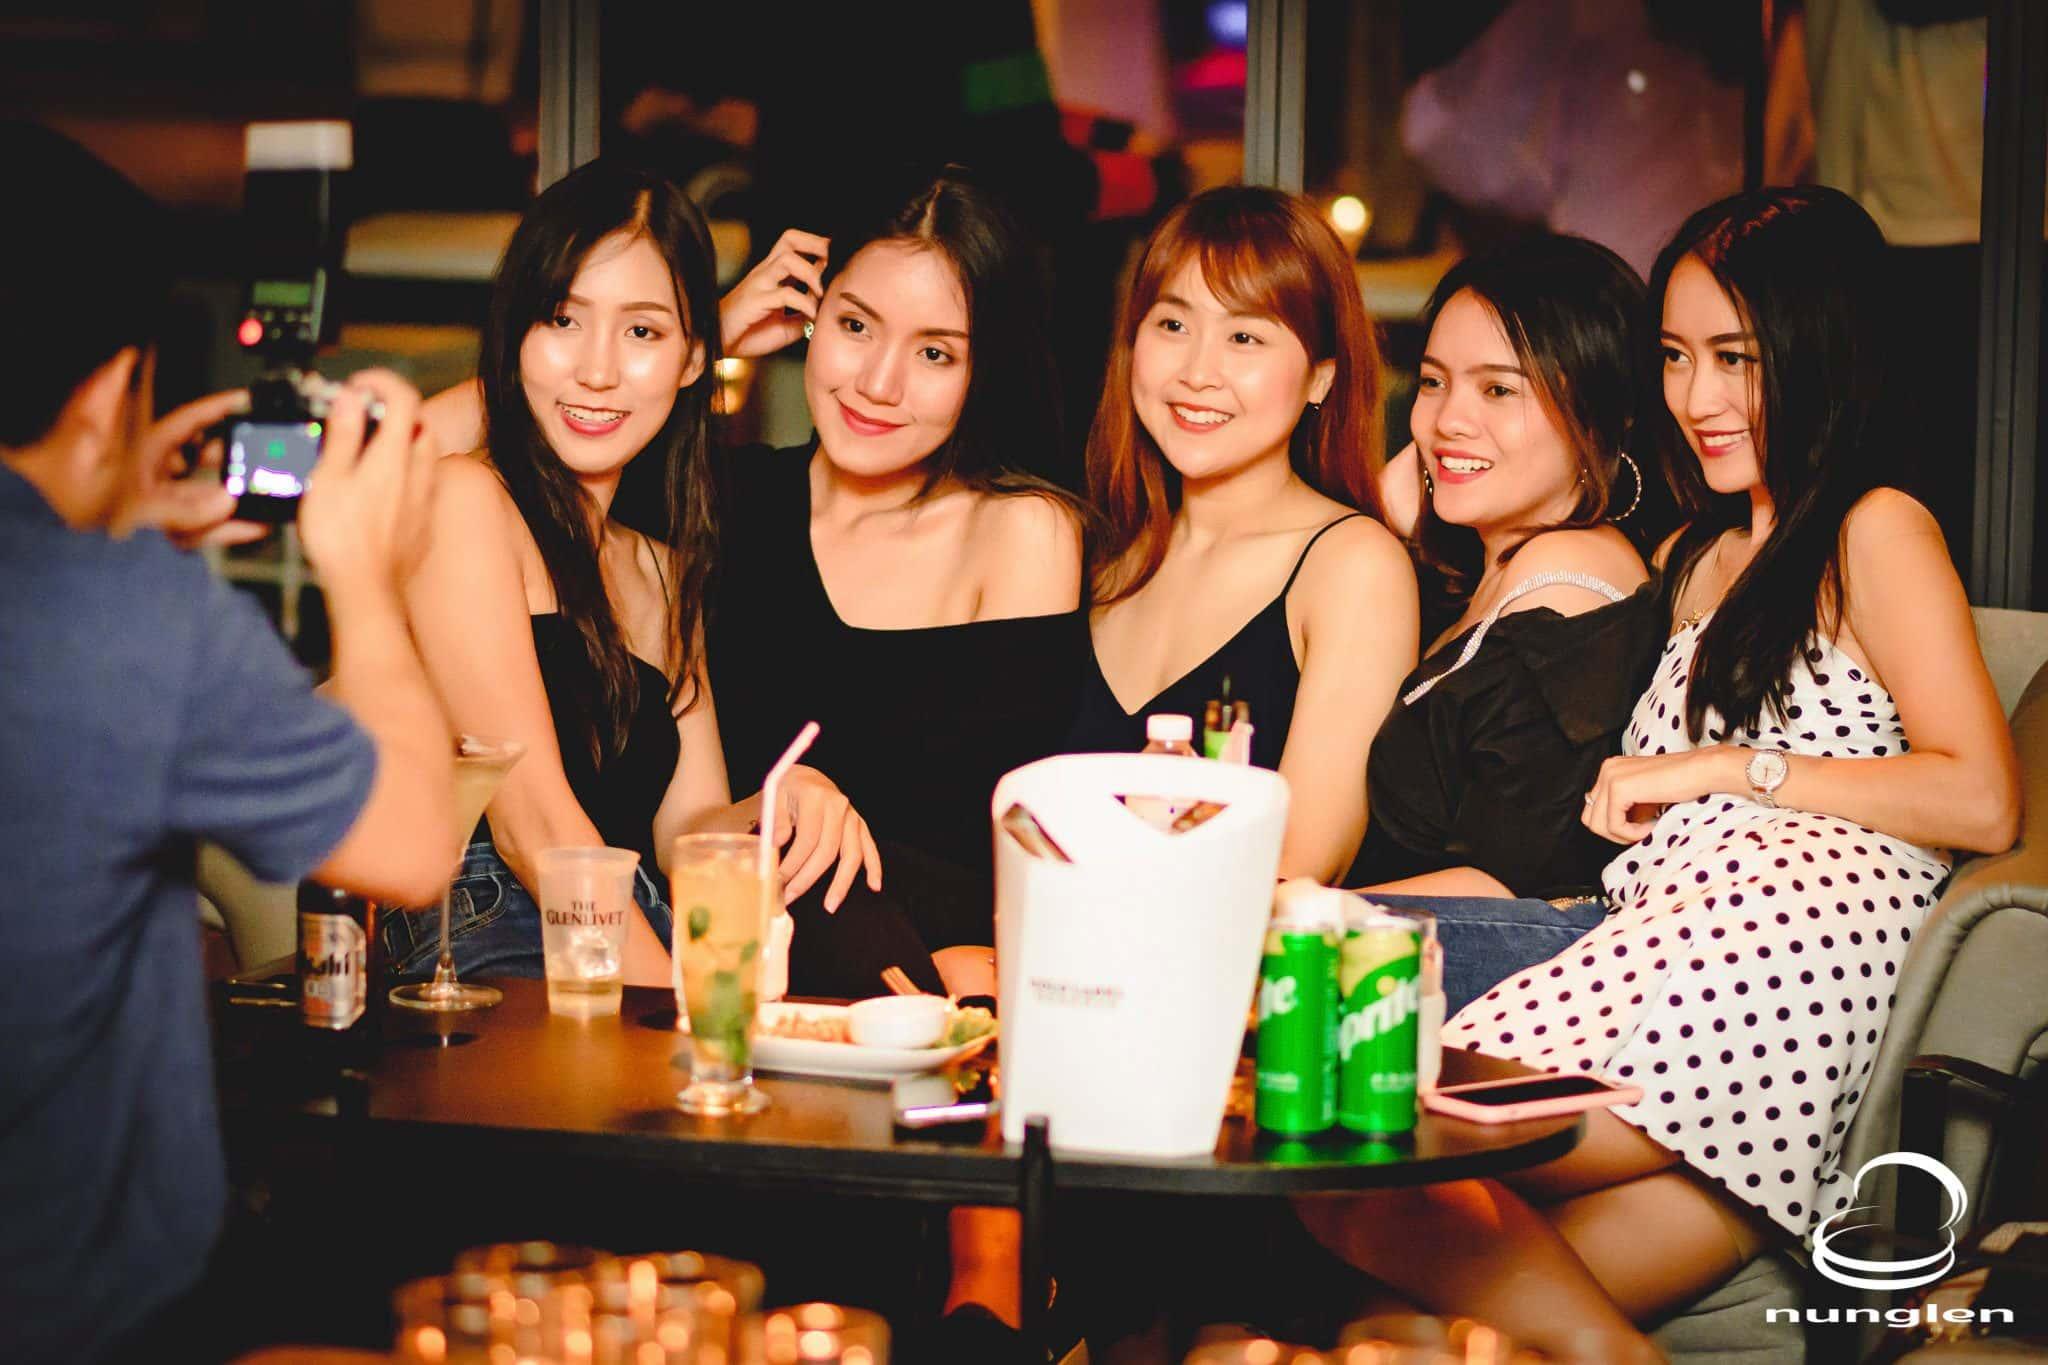 Girls in to get bangkok where The Likelihood